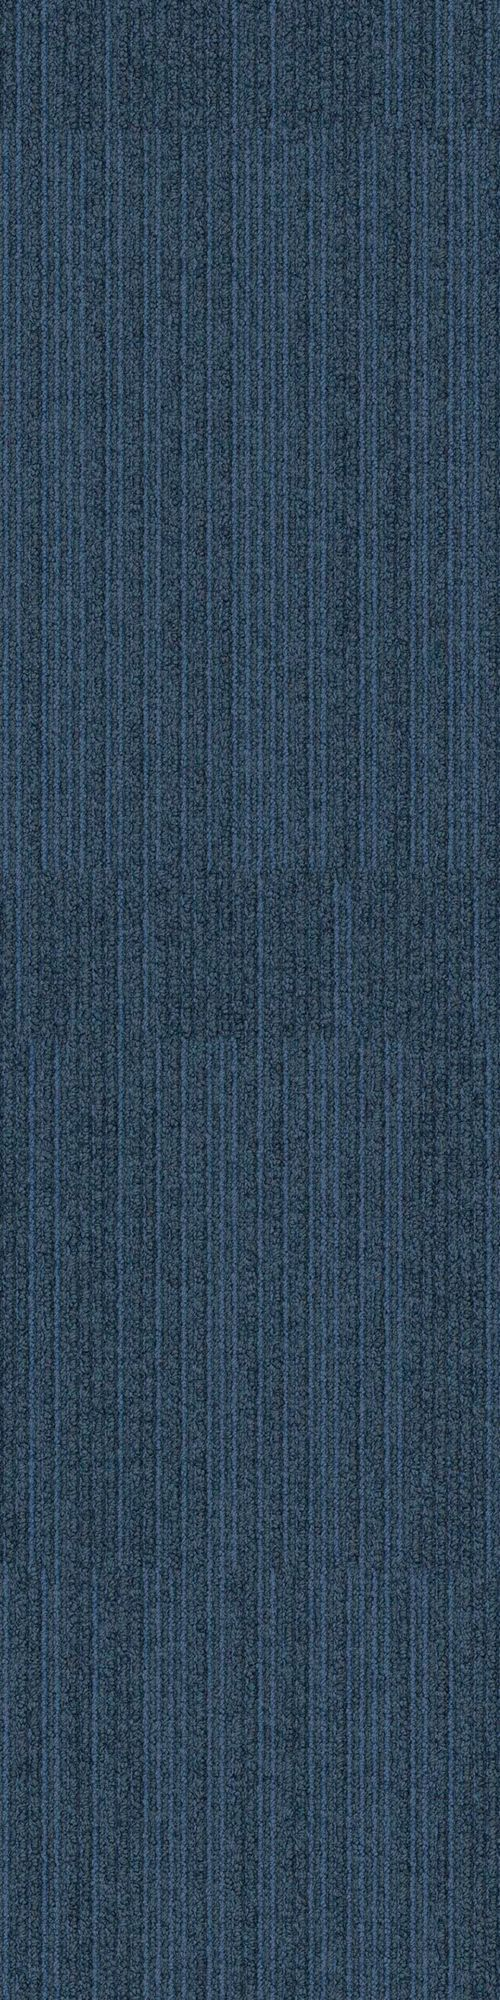 Interface carpet tile: On Line Color name: Ocean Variant 7